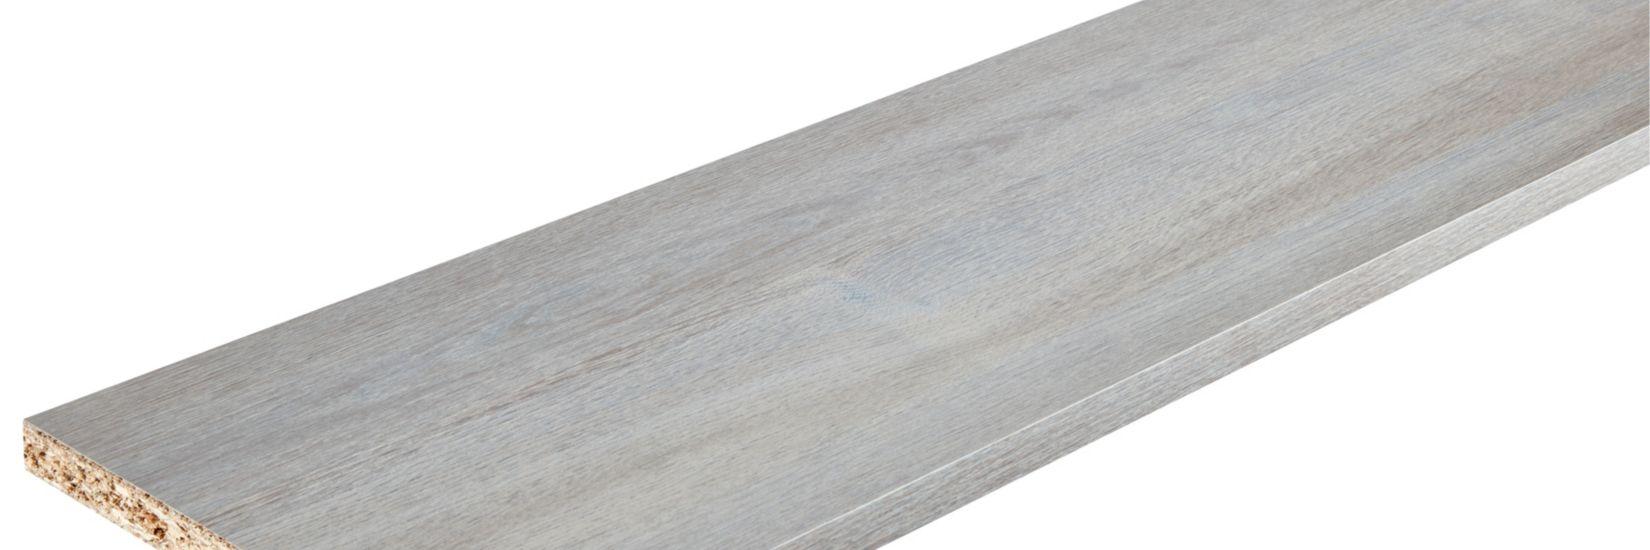 Grey Furniture Board Panels